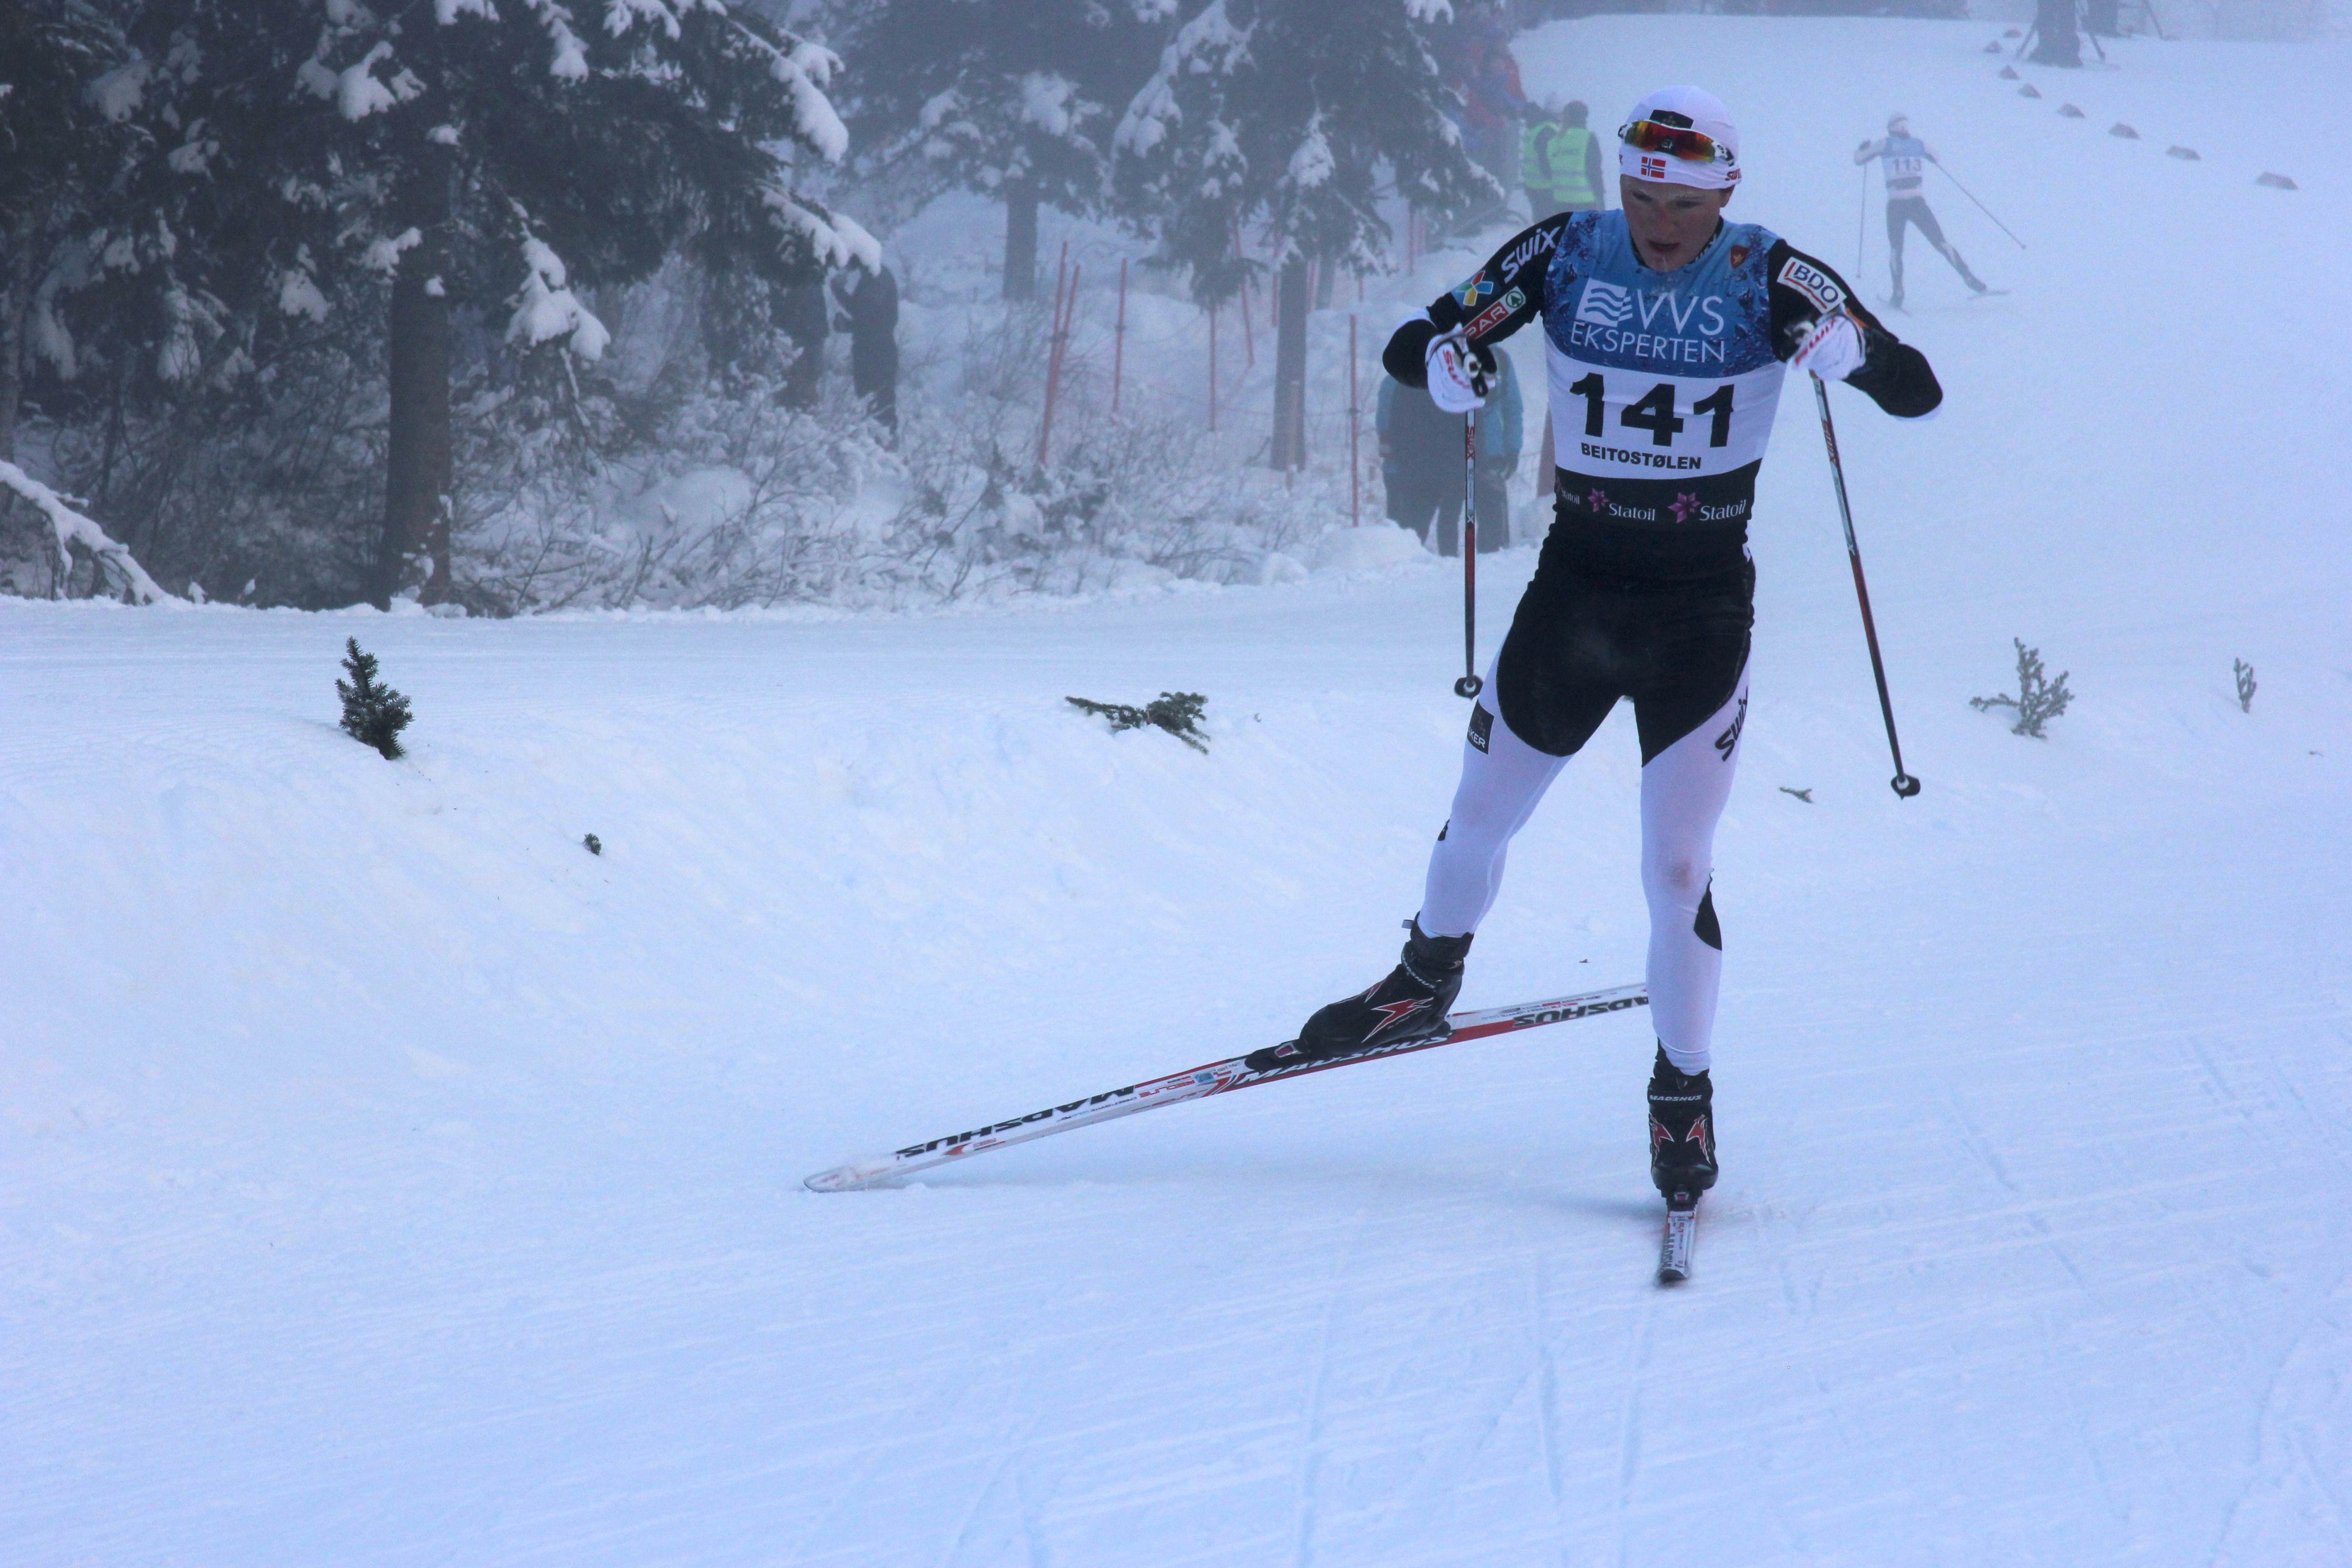 https://fasterskier.com/wp-content/blogs.dir/1/files/2015/01/Simen-Andreas-Sveen-Beito-2014-Photo-Inge-Scheve.jpg